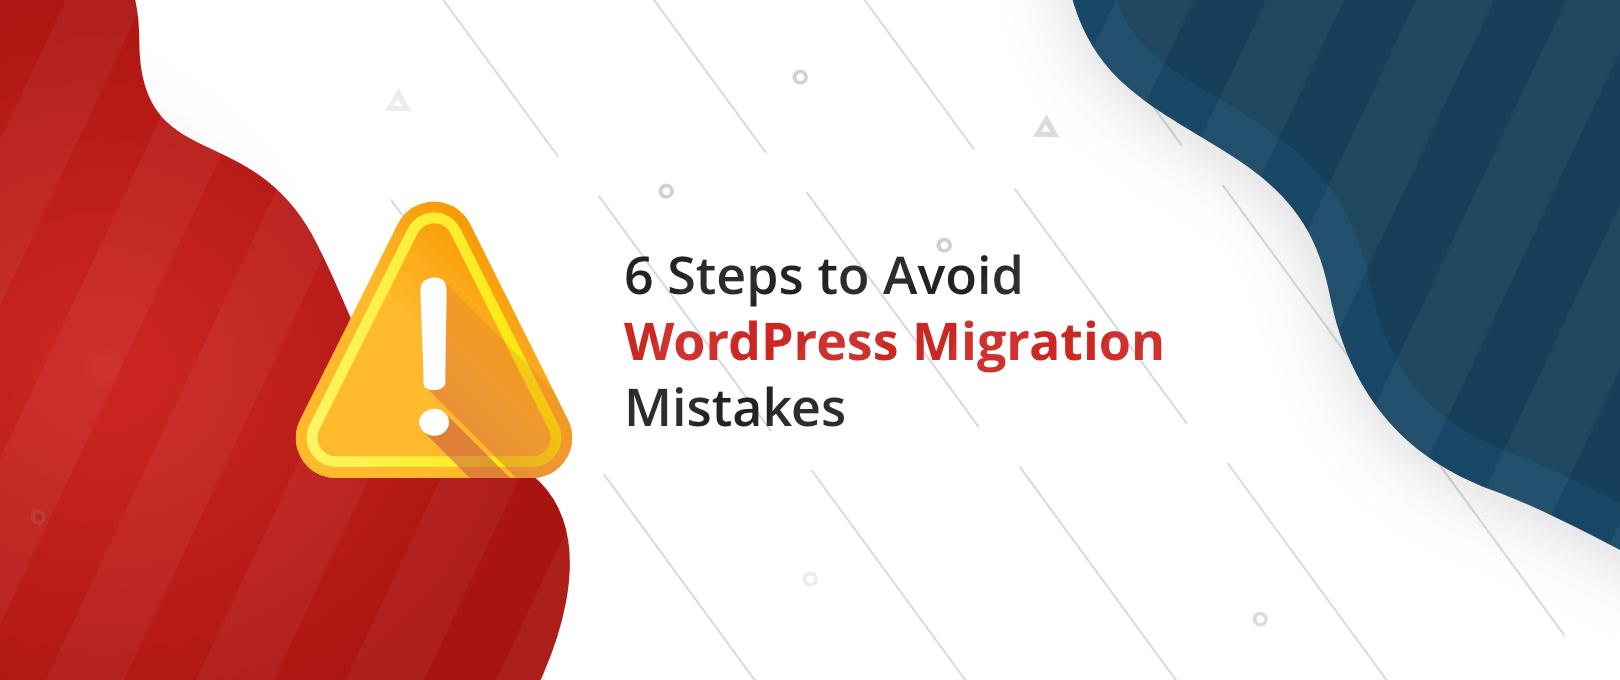 WordPress Migration Mistakes